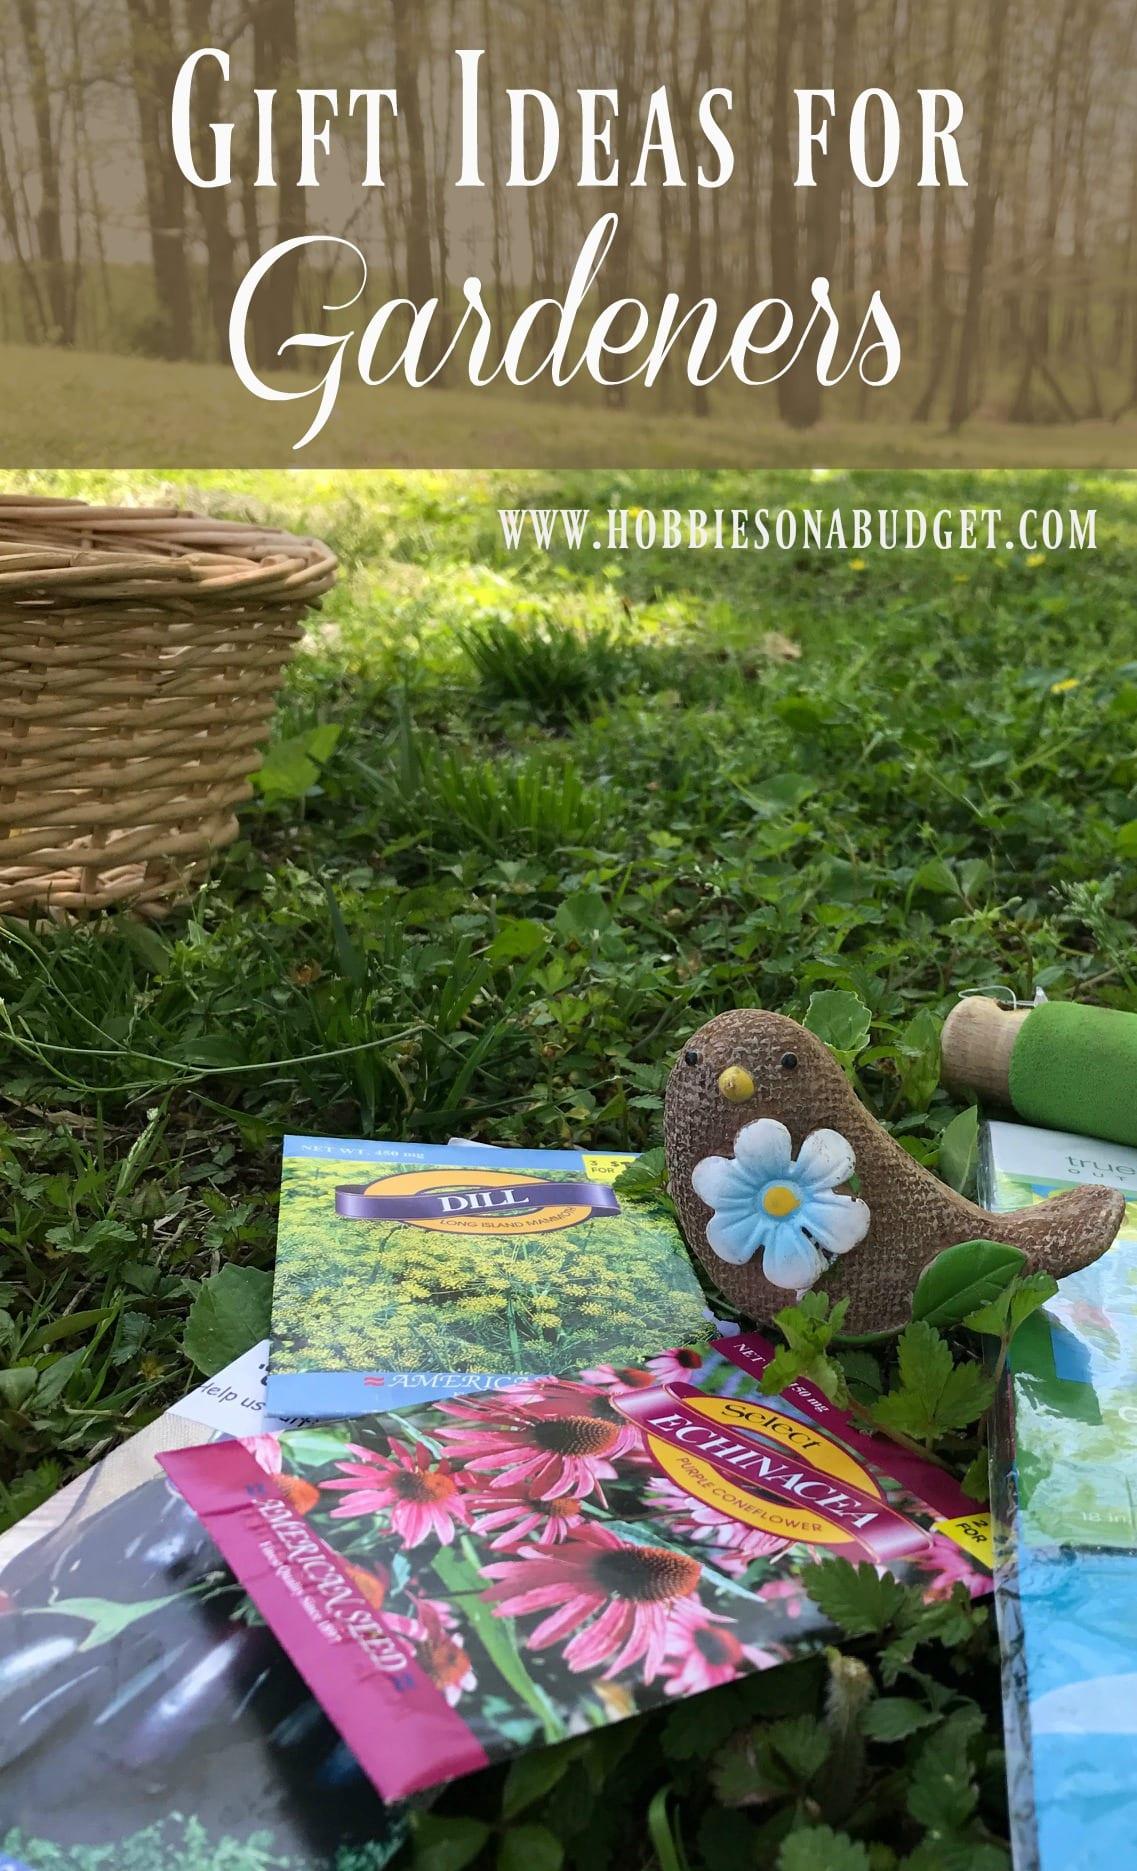 Gift Ideas For Gardeners diy gifts for gardeners httpourfairfieldhomeandgardencomdiy gifts Gift Ideas For Gardeners